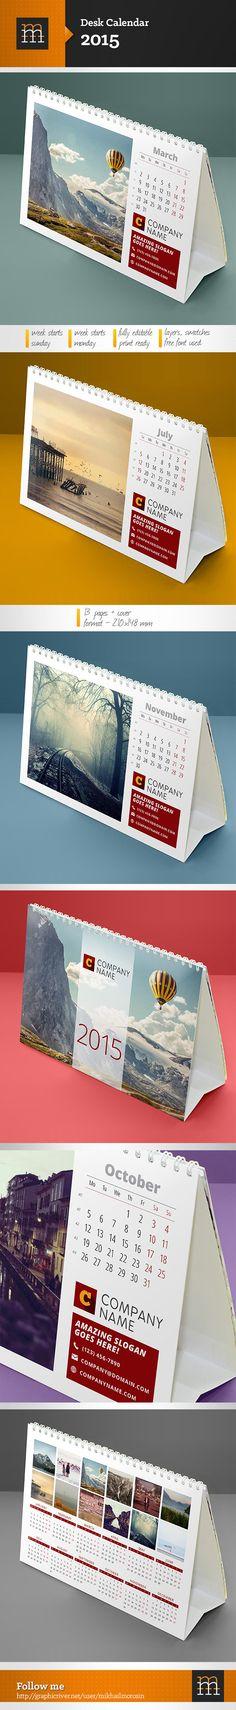 Desk Calendar 2015 on Behance